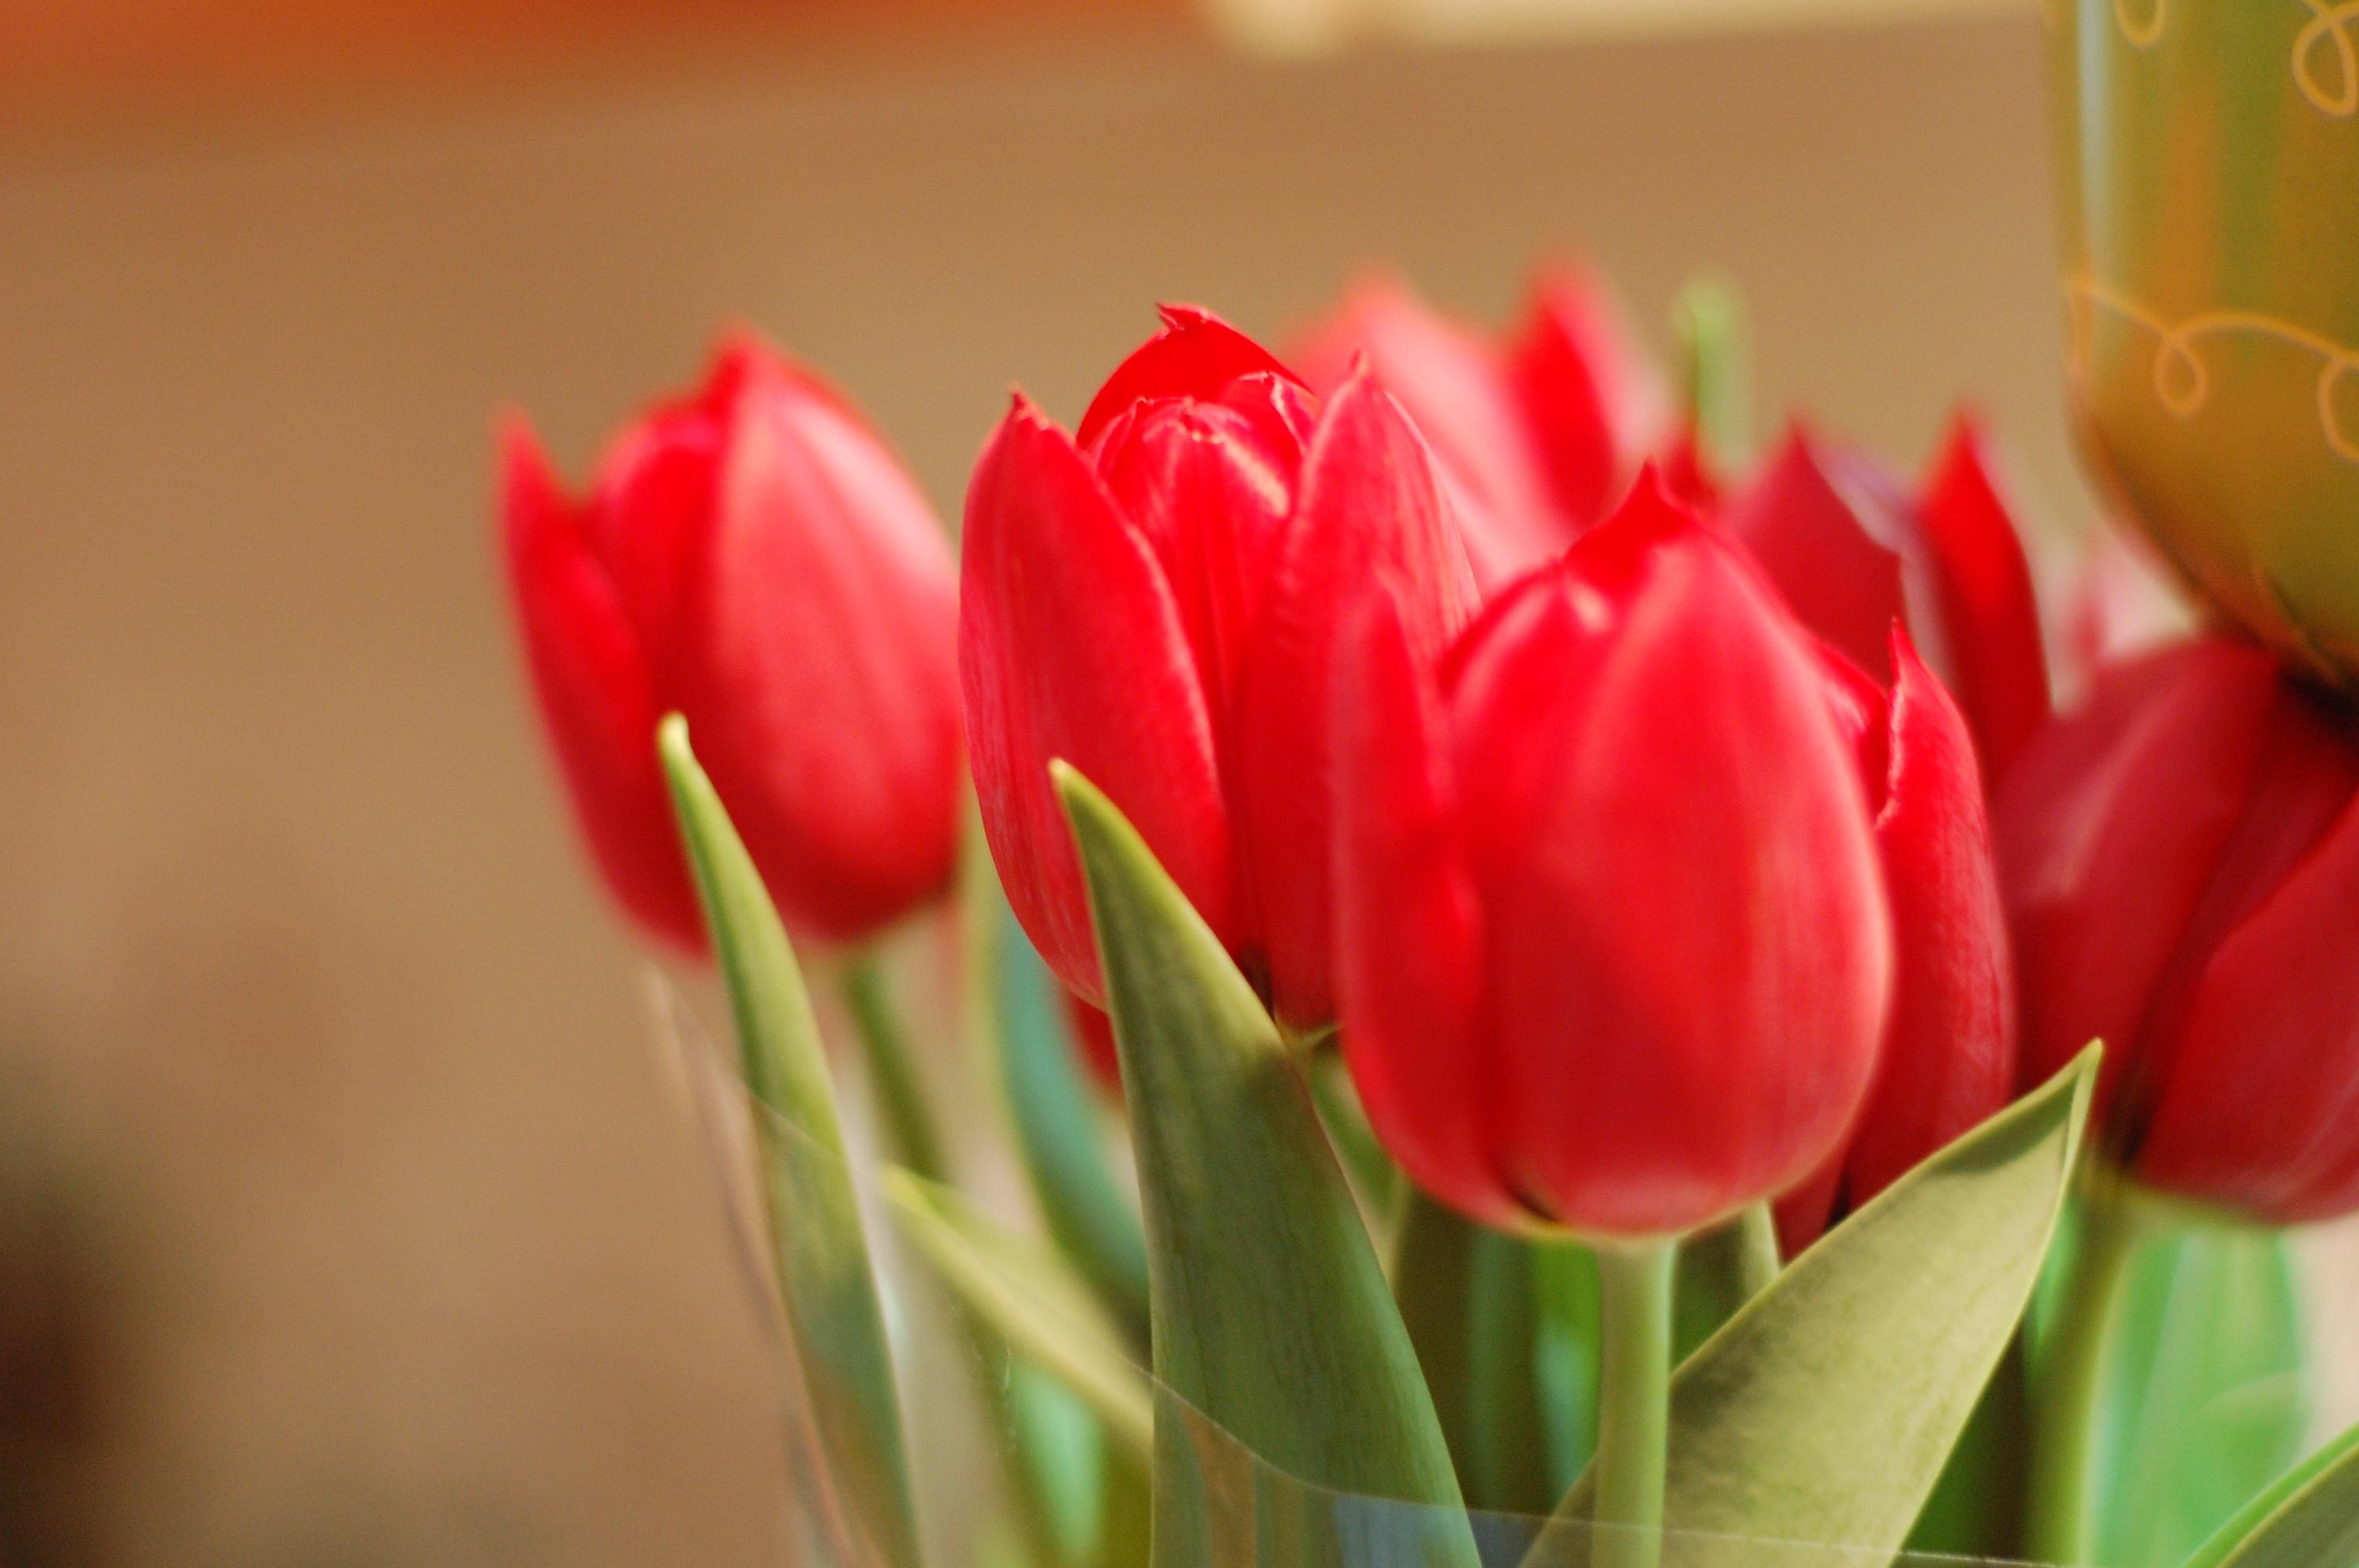 красные тюльпаны бутоны цветы скачать